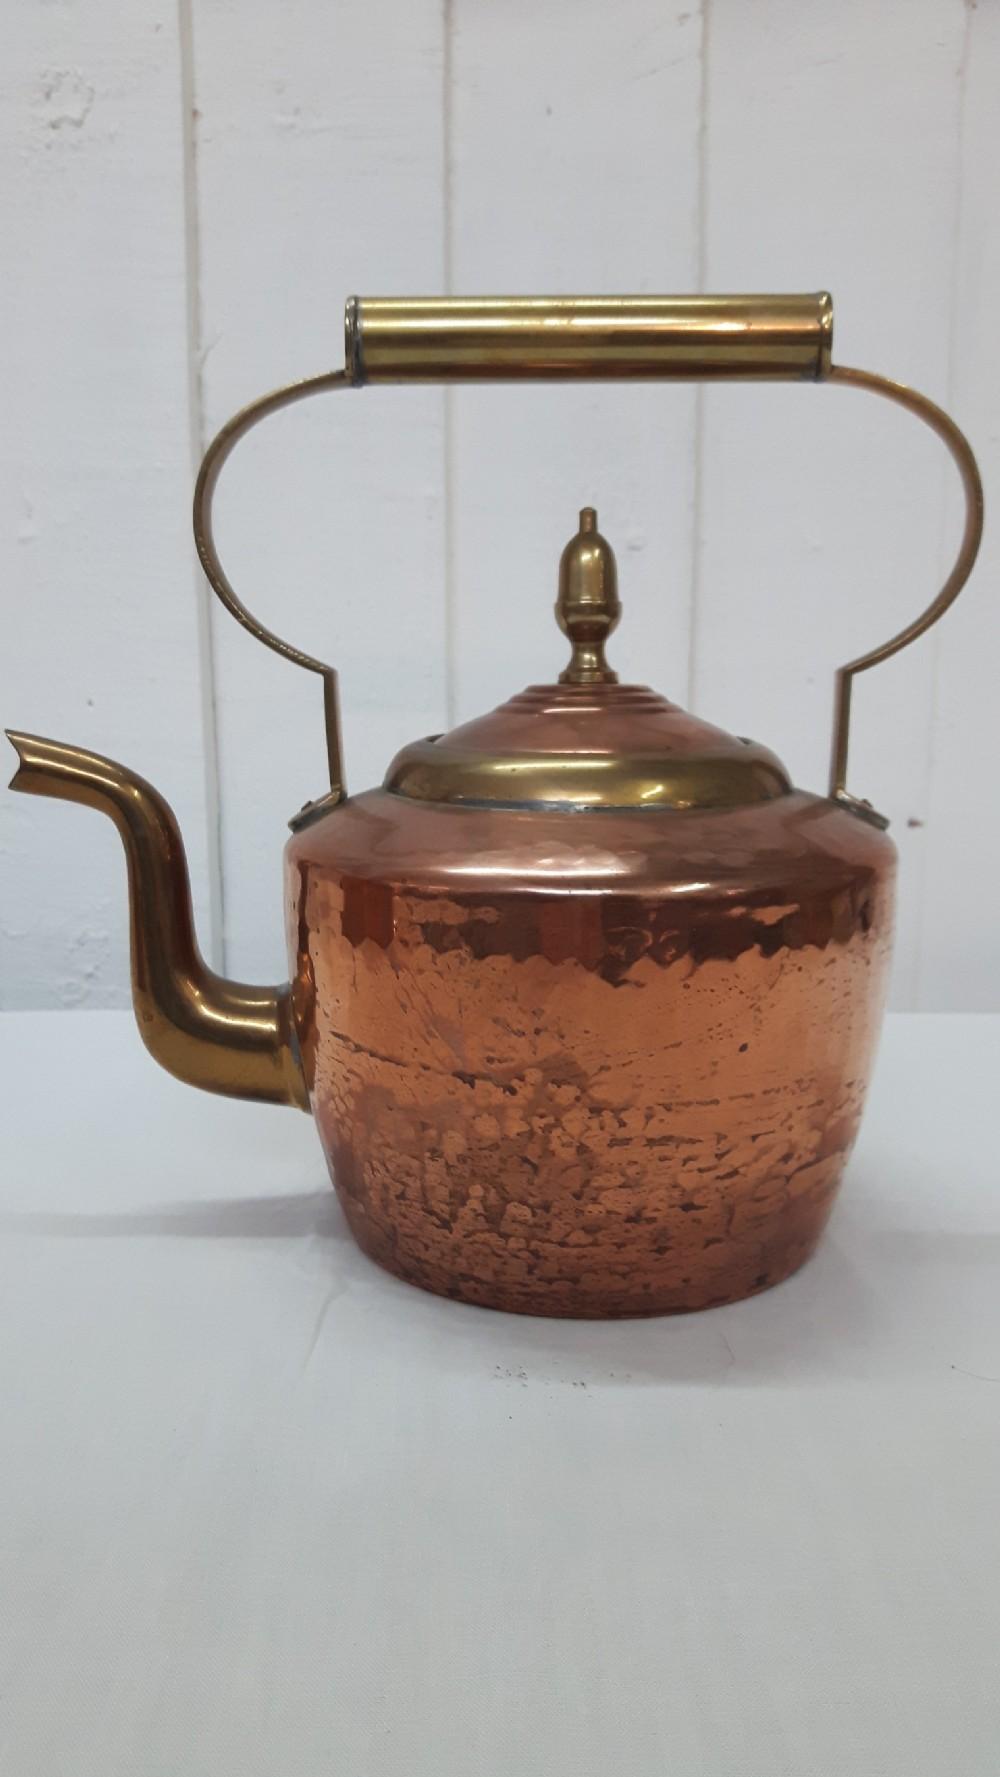 dating antique copper